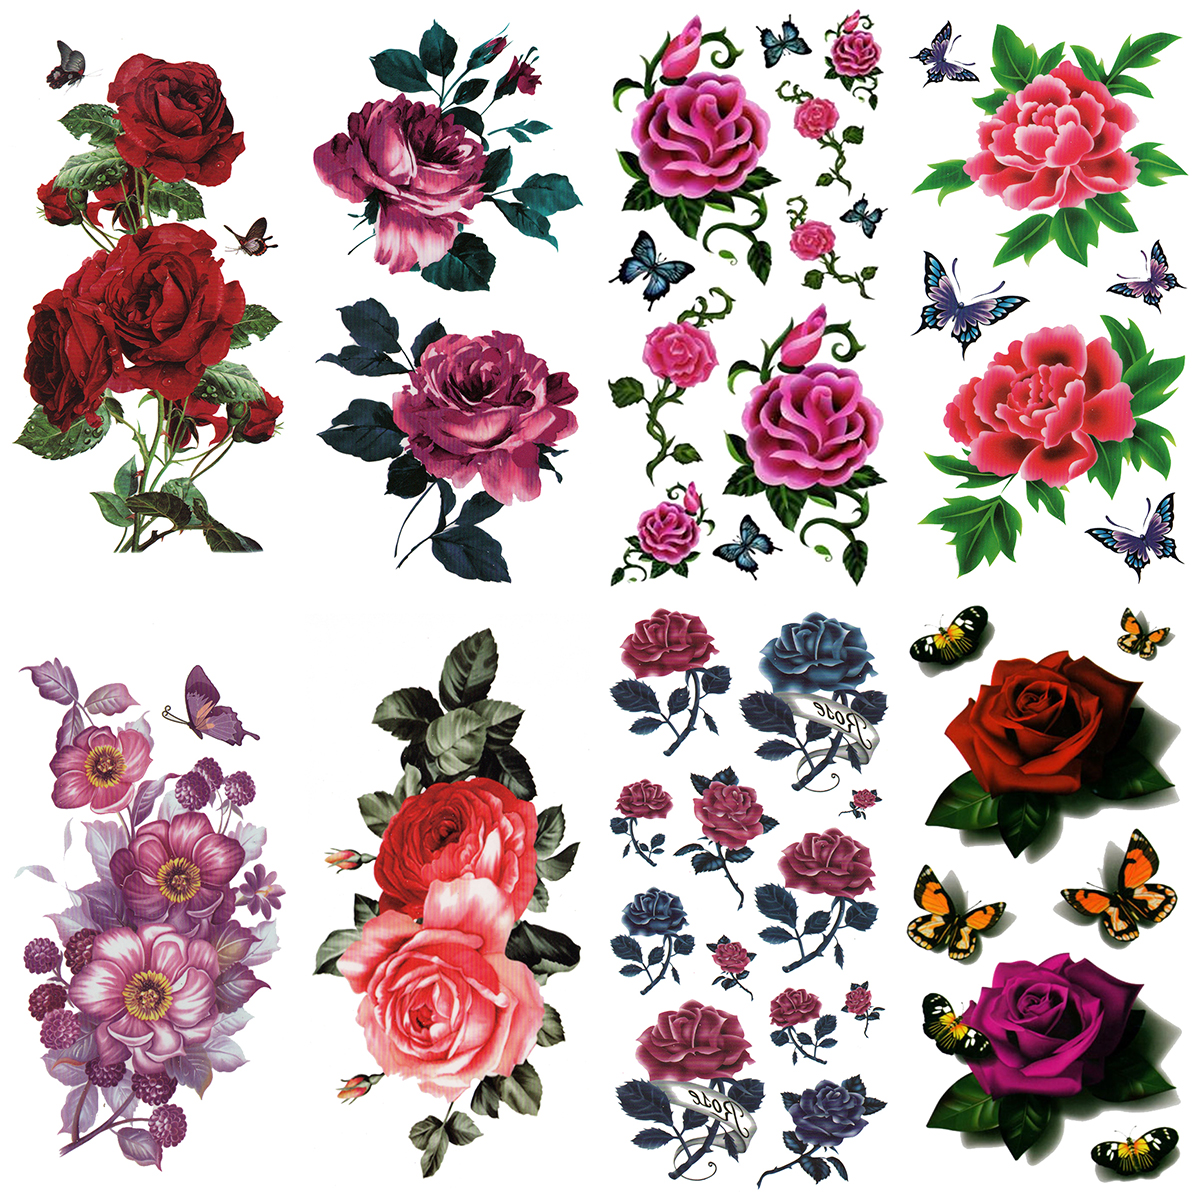 [THE FANTASY (ファンタジー)] タトゥーシール 薔薇 花 バラ 蝶 [8種8枚] ymx8025